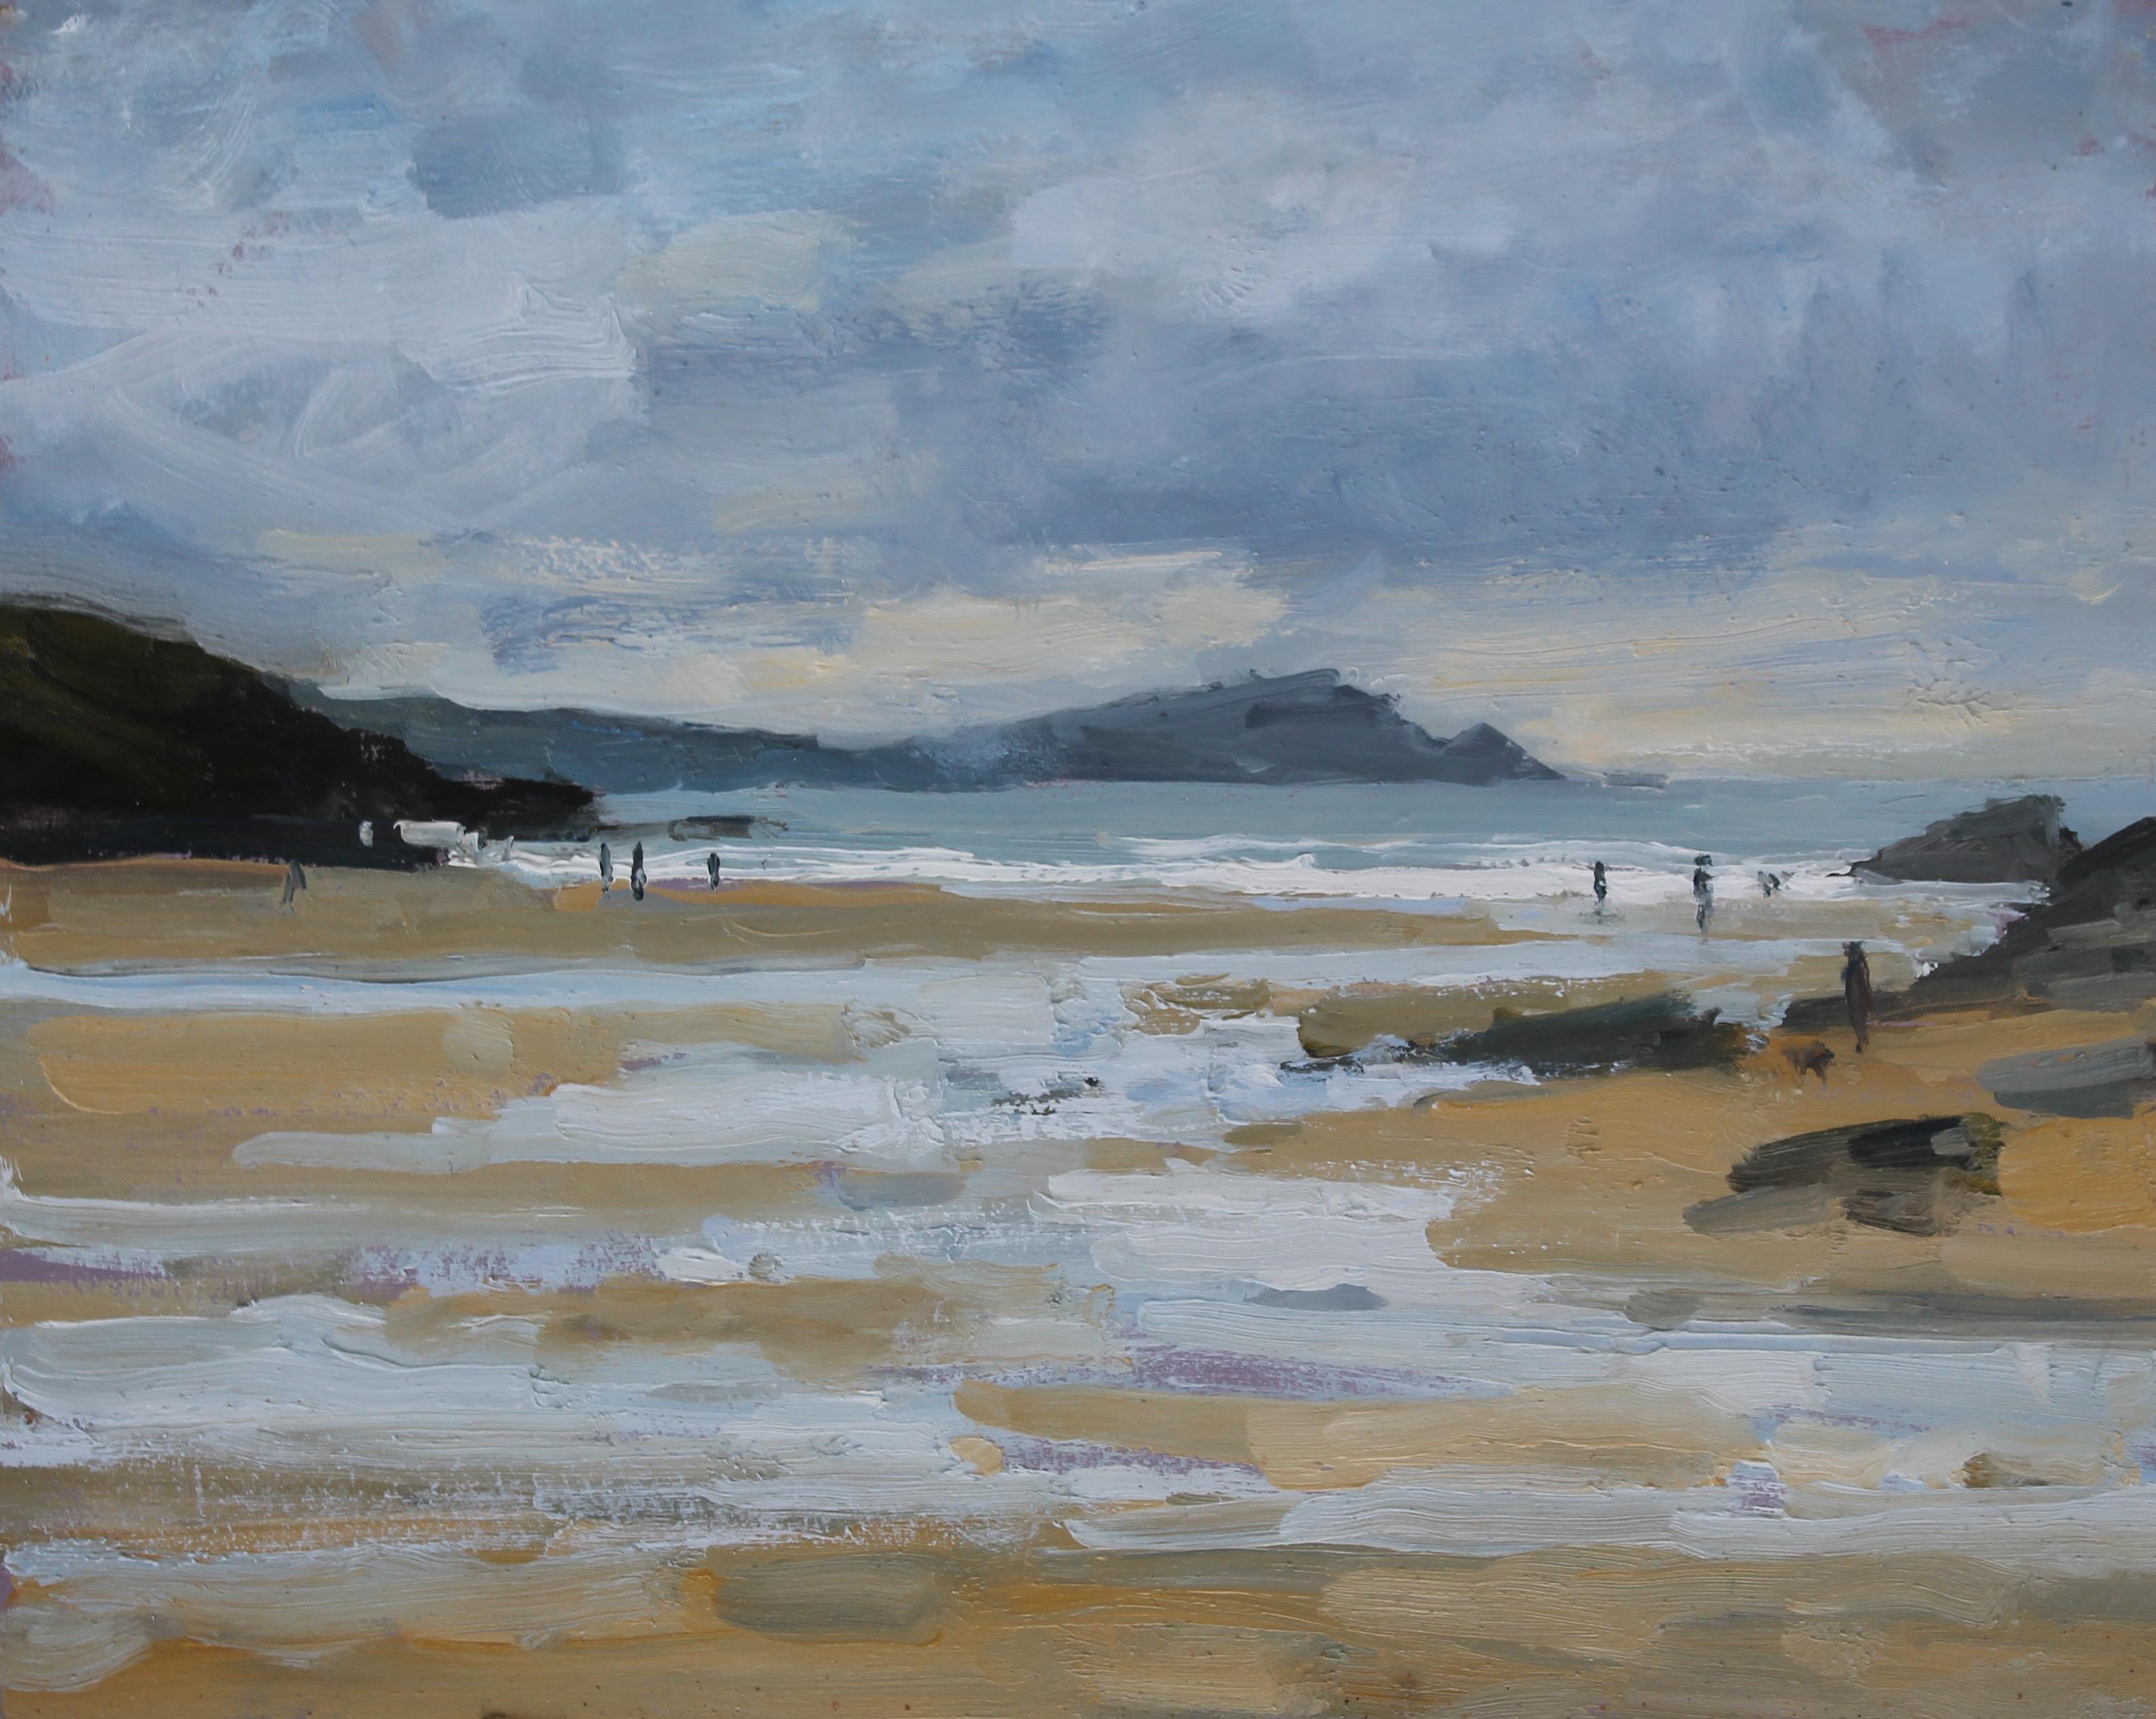 Low Tide, Porth Beach